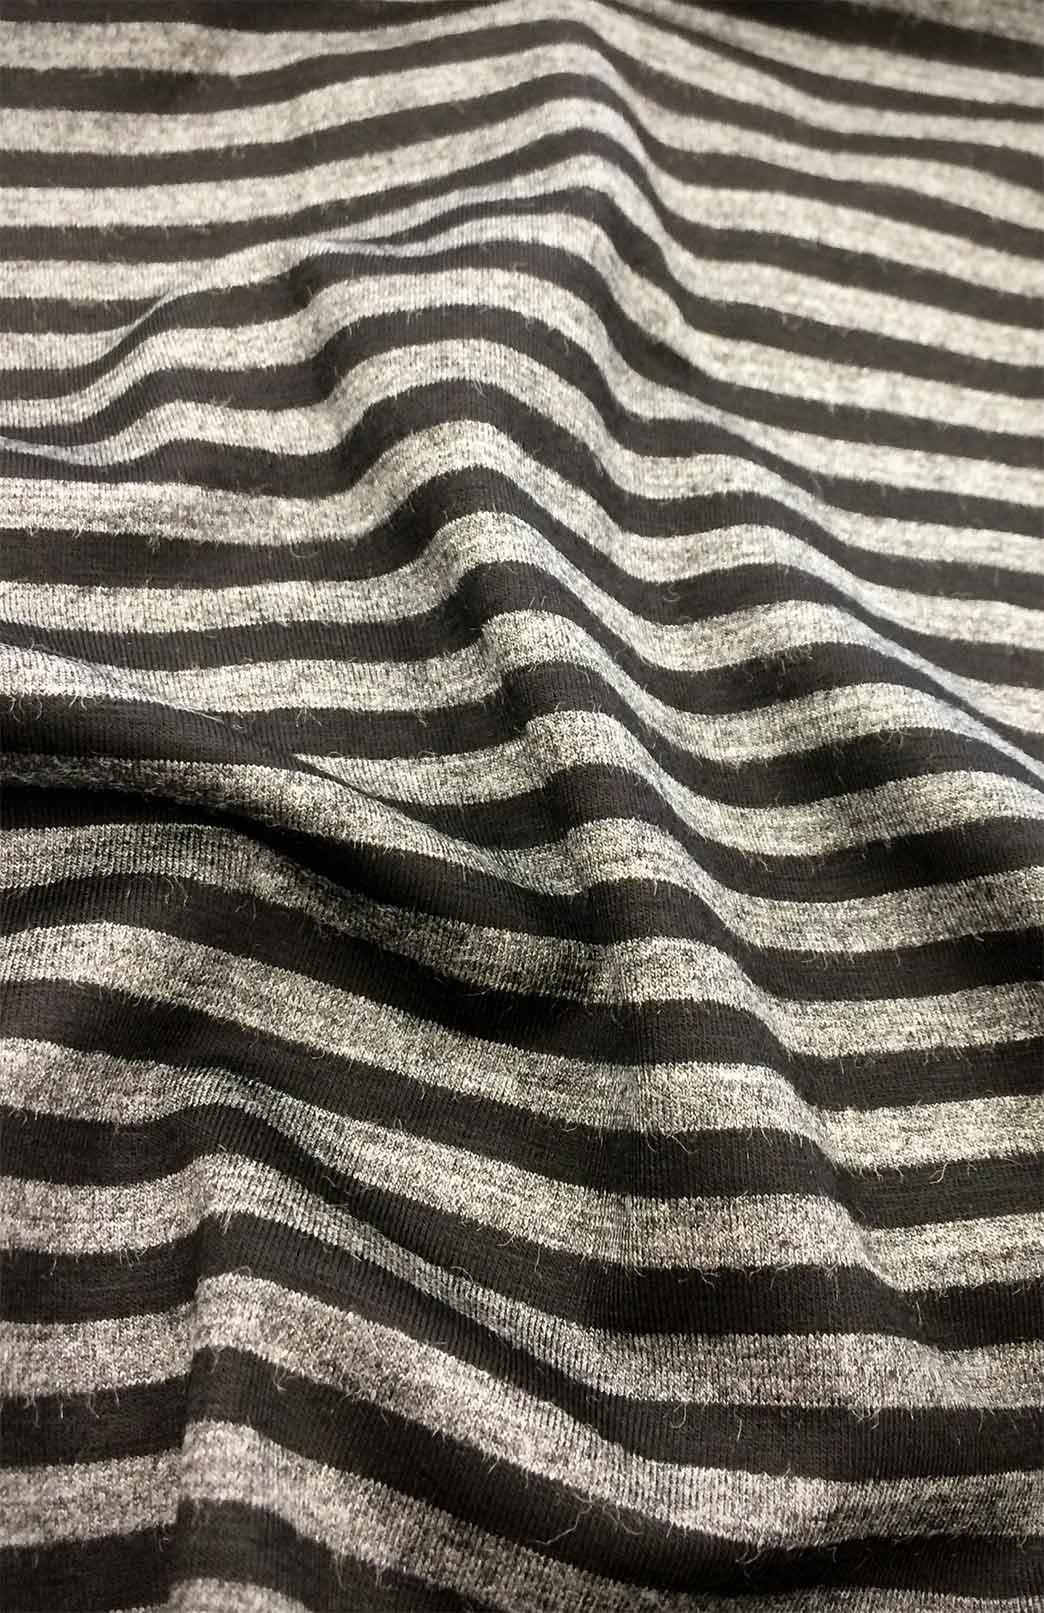 Maxi Skirt - Patterned - Women's Black and Grey Striped Merino Wool Blend Maxi Skirt with Wide Waistband - Smitten Merino Tasmania Australia